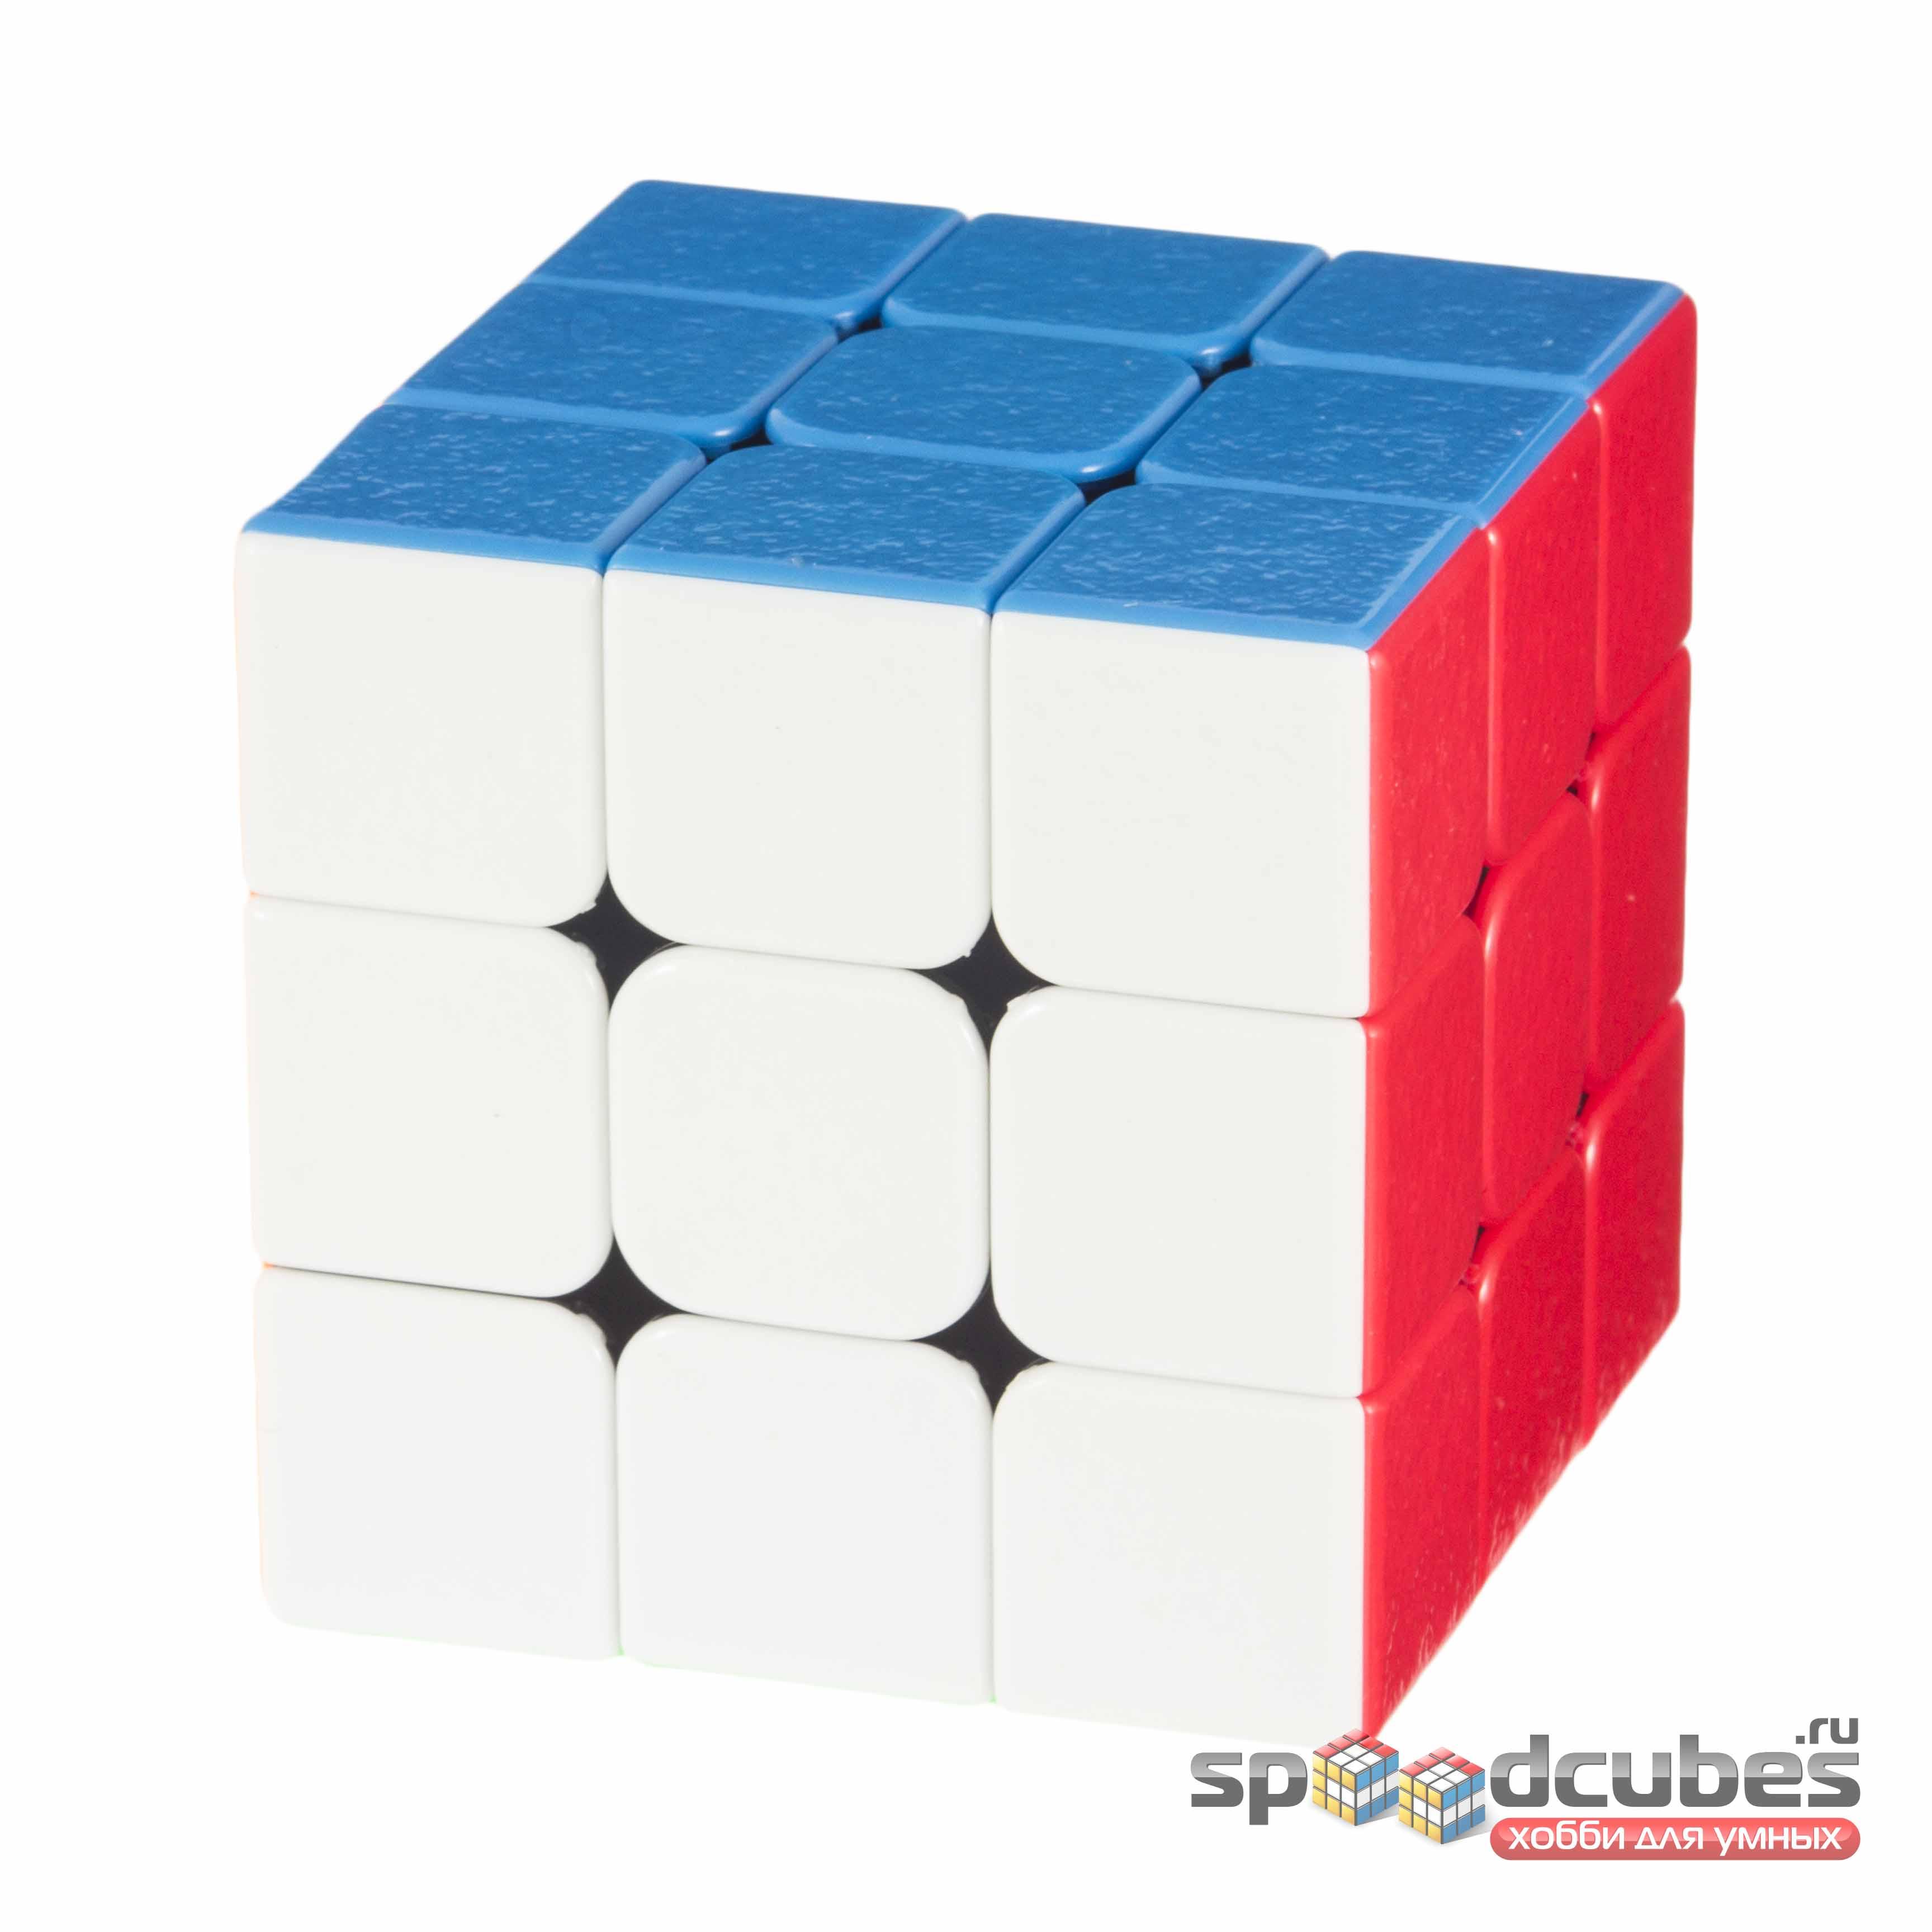 ShengShou 3x3x3 Gem